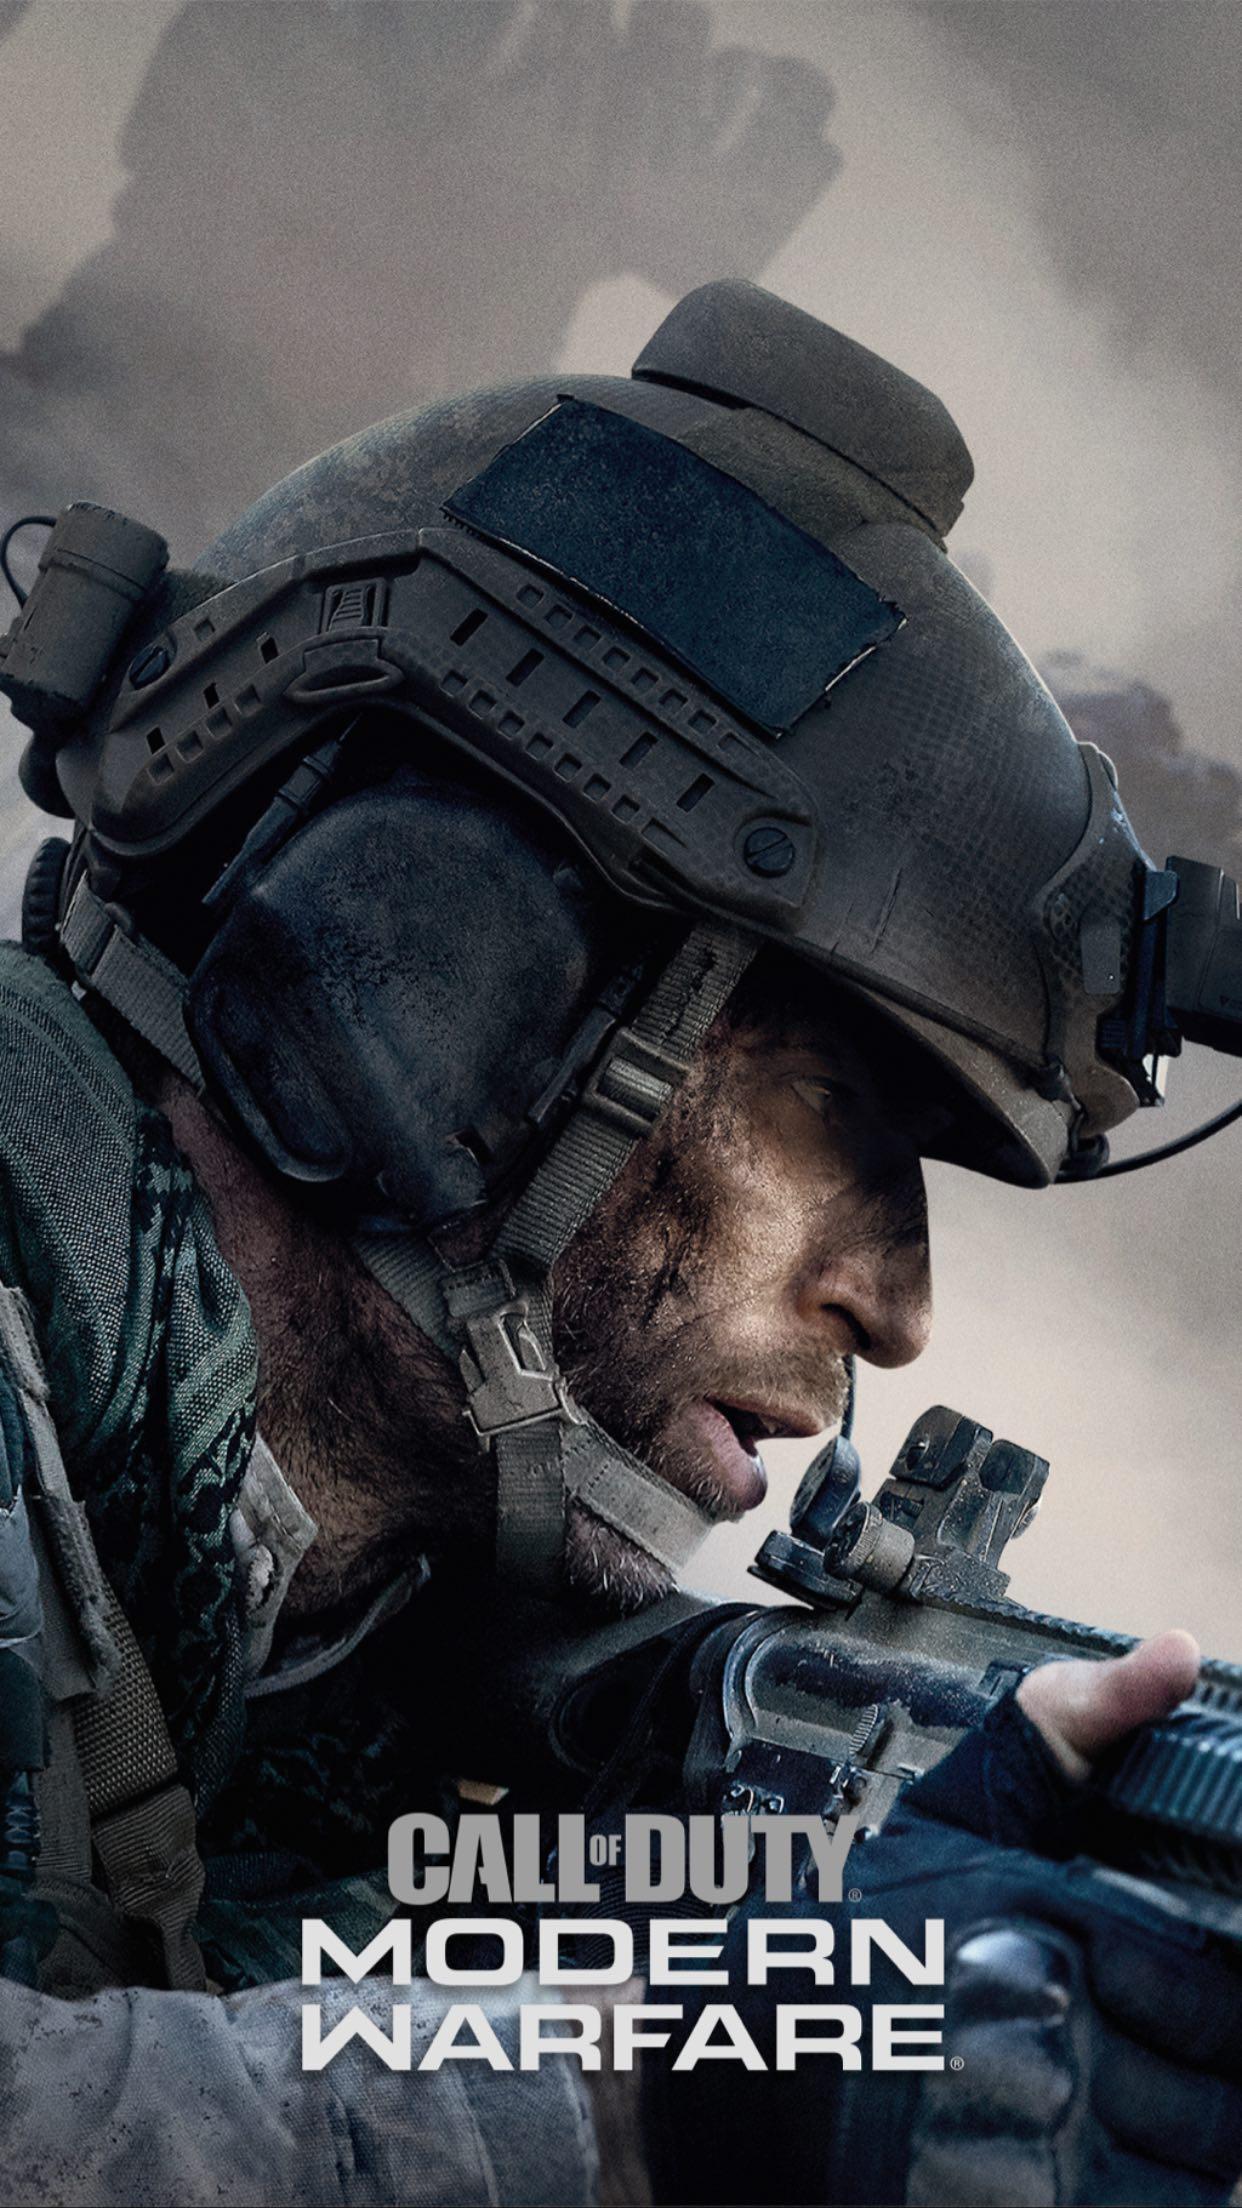 Cool Call Of Duty Modern Warfare Iphone Wallpapers Top Free Cool Call Of Duty Modern Warfare Iphone Backgrounds Wallpaperaccess